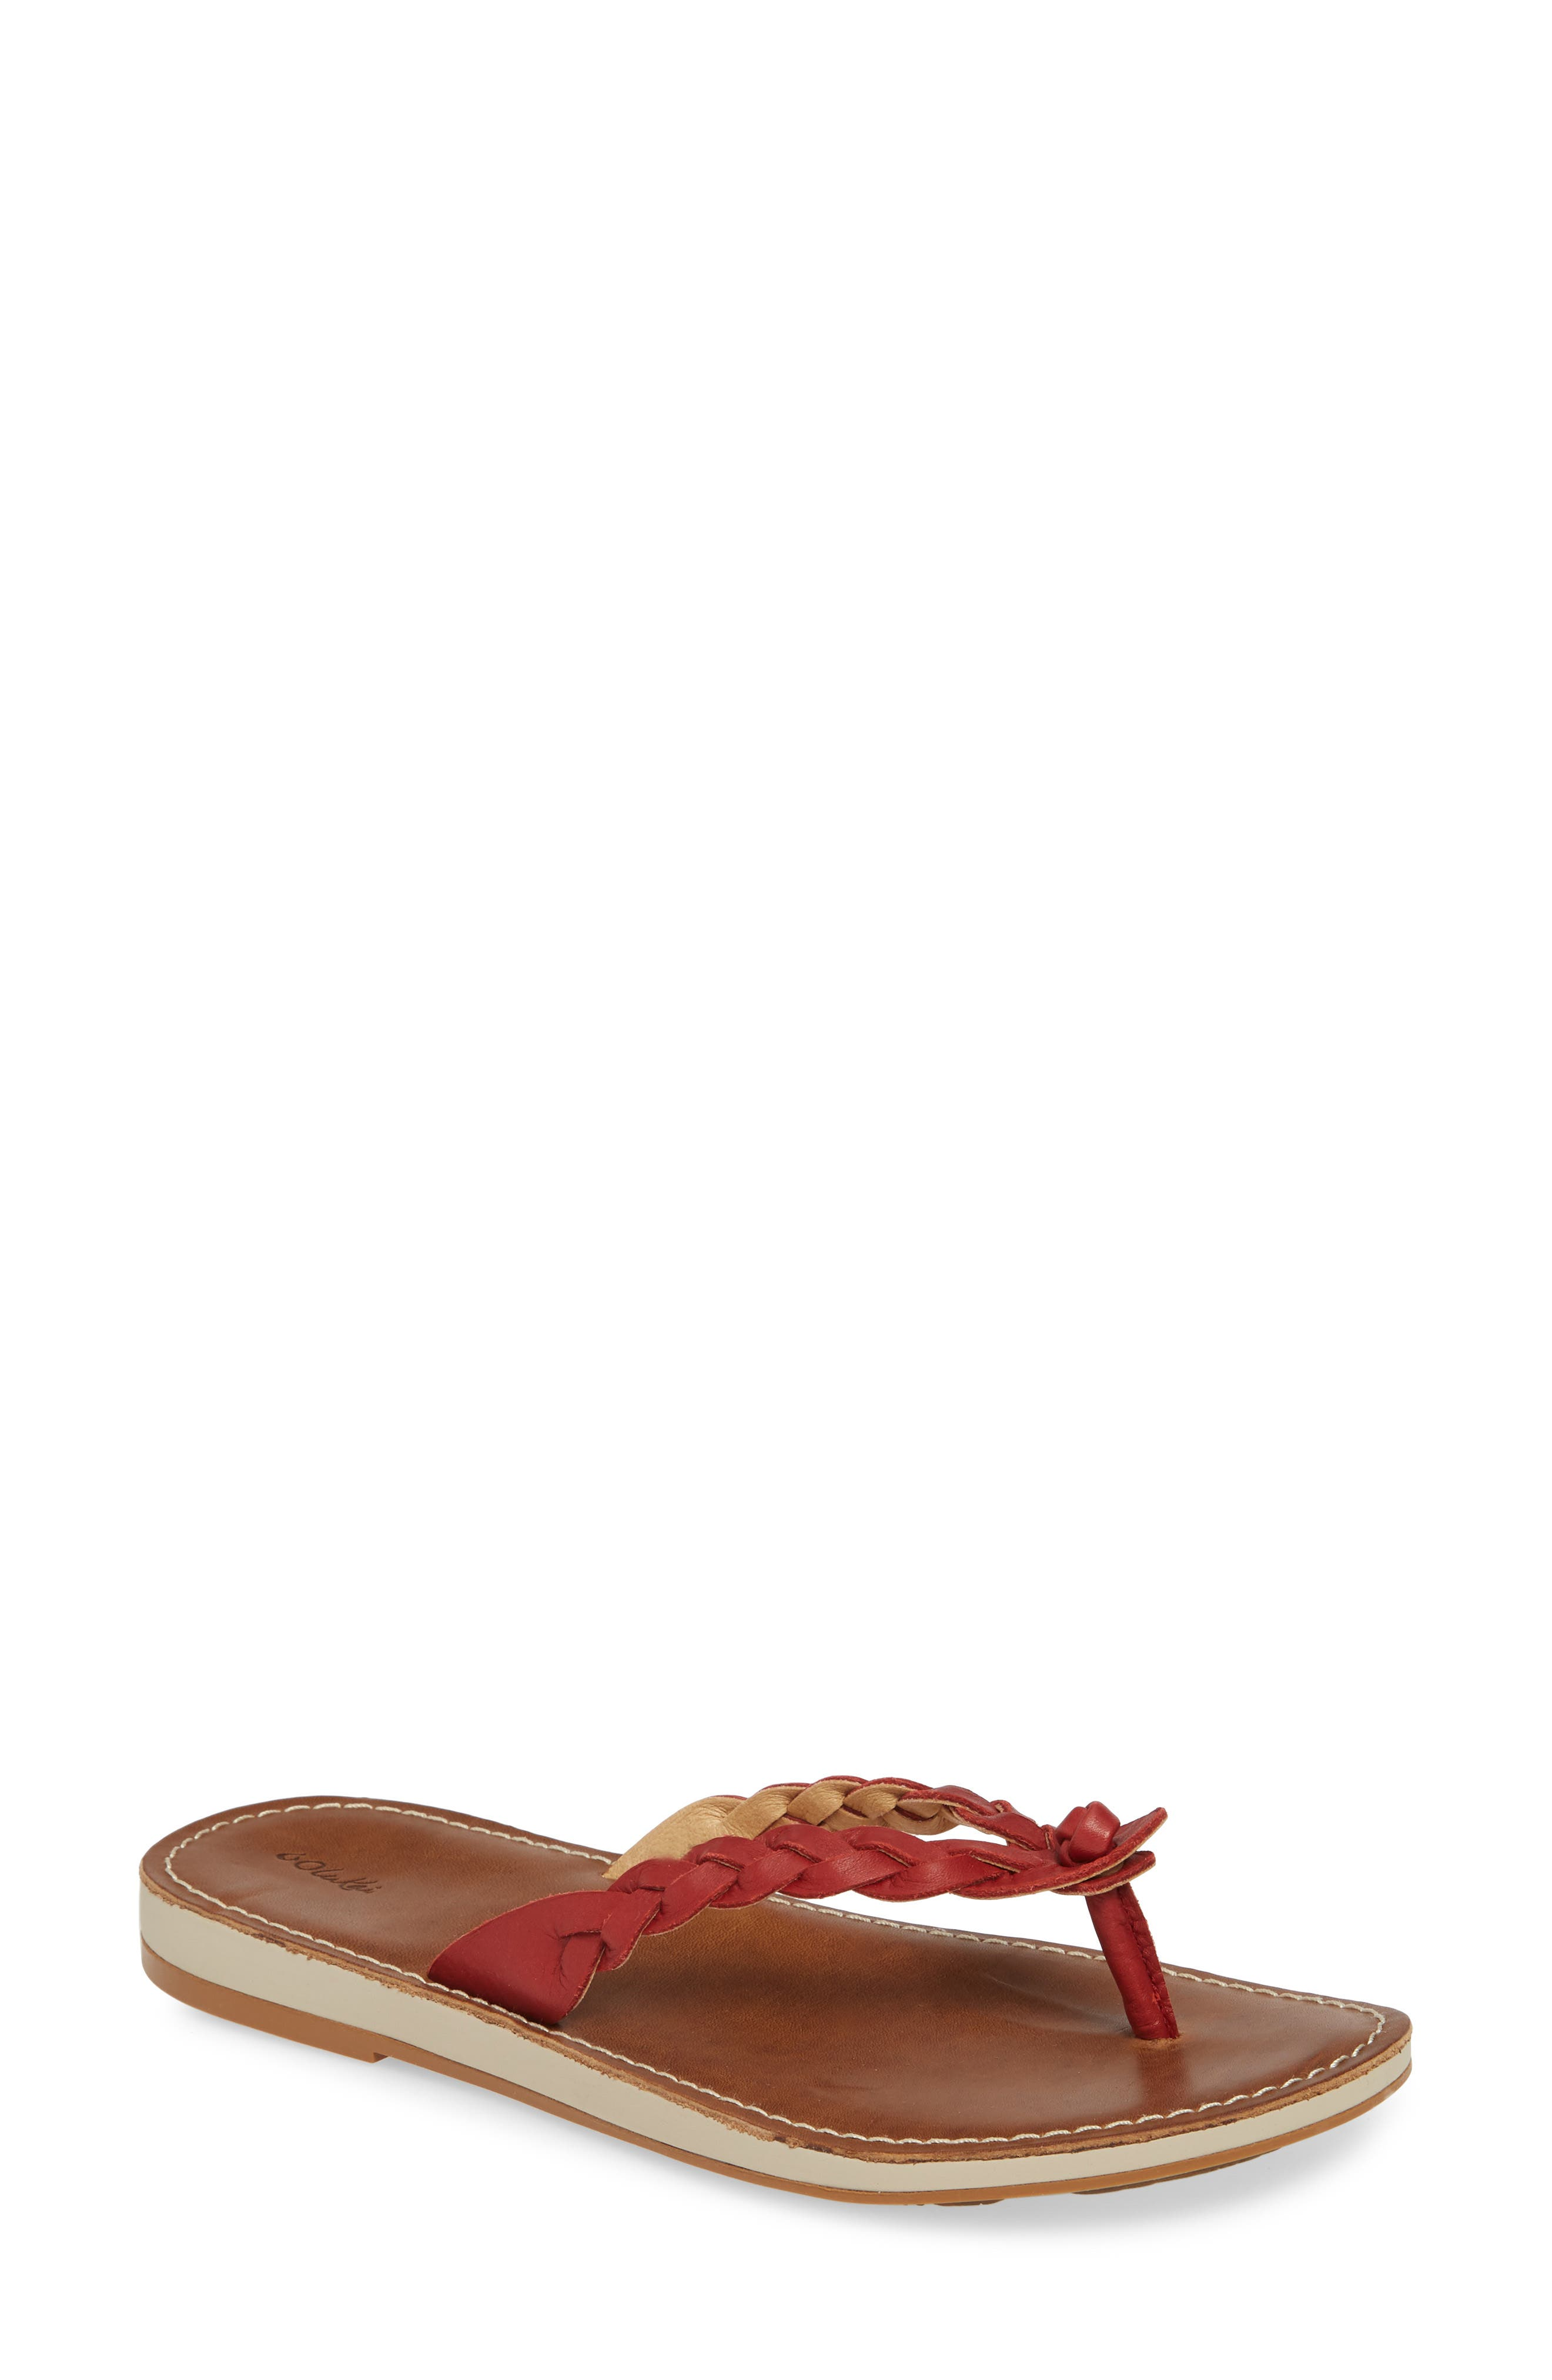 Olukai Kahiko Flip Flop, Red